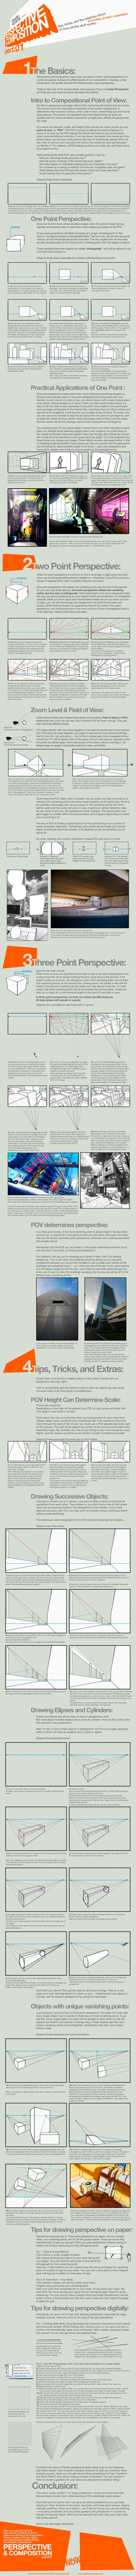 "Perspective  Composition | Part 1 | MORE on http://www.pinterest.com/emmadavis17/for-design-students/ ""For Design Students"""